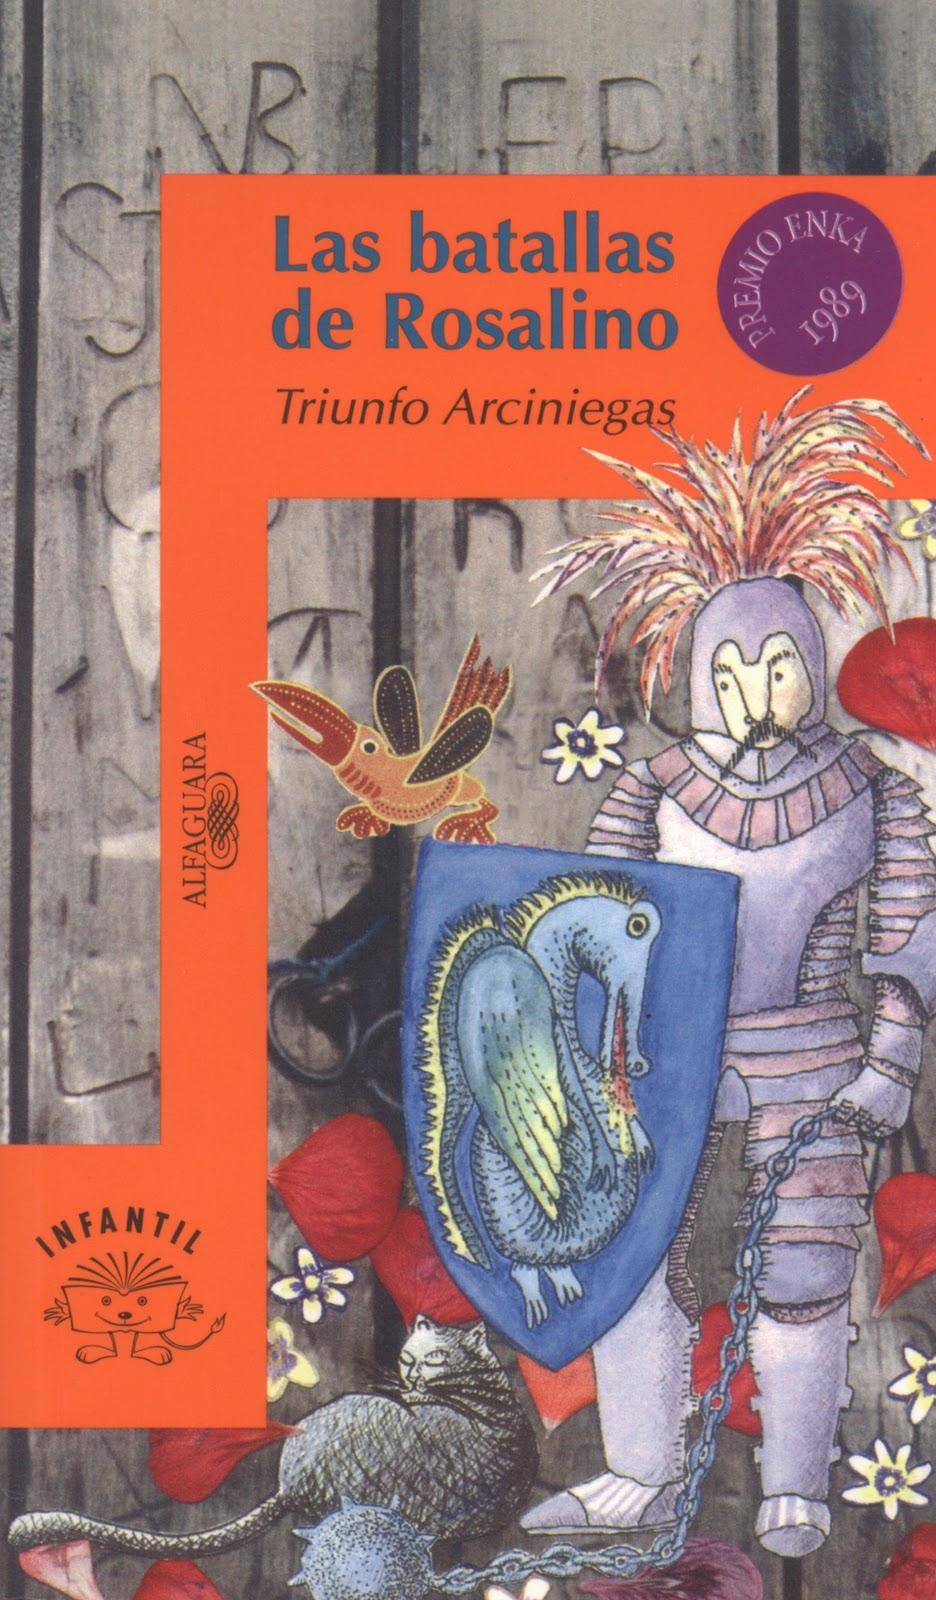 De otros mundos: Triunfo Arciniegas según Jorge Cadavid